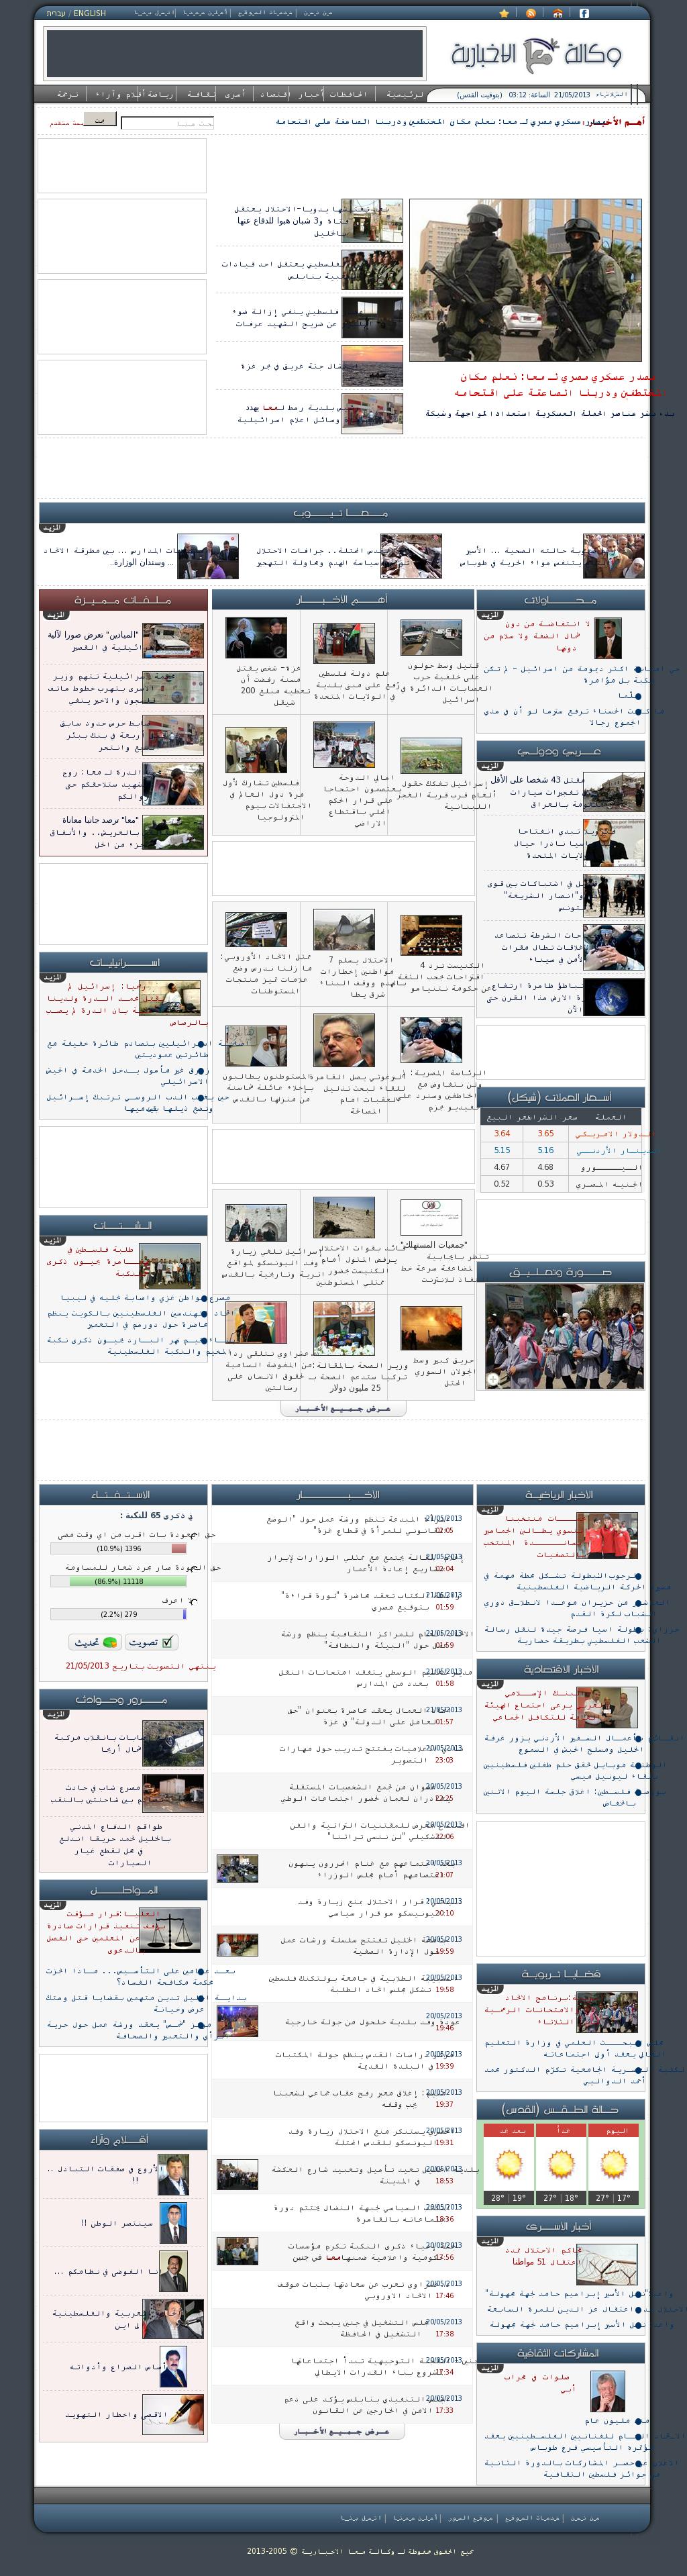 Ma'an News at Tuesday May 21, 2013, 12:12 a.m. UTC